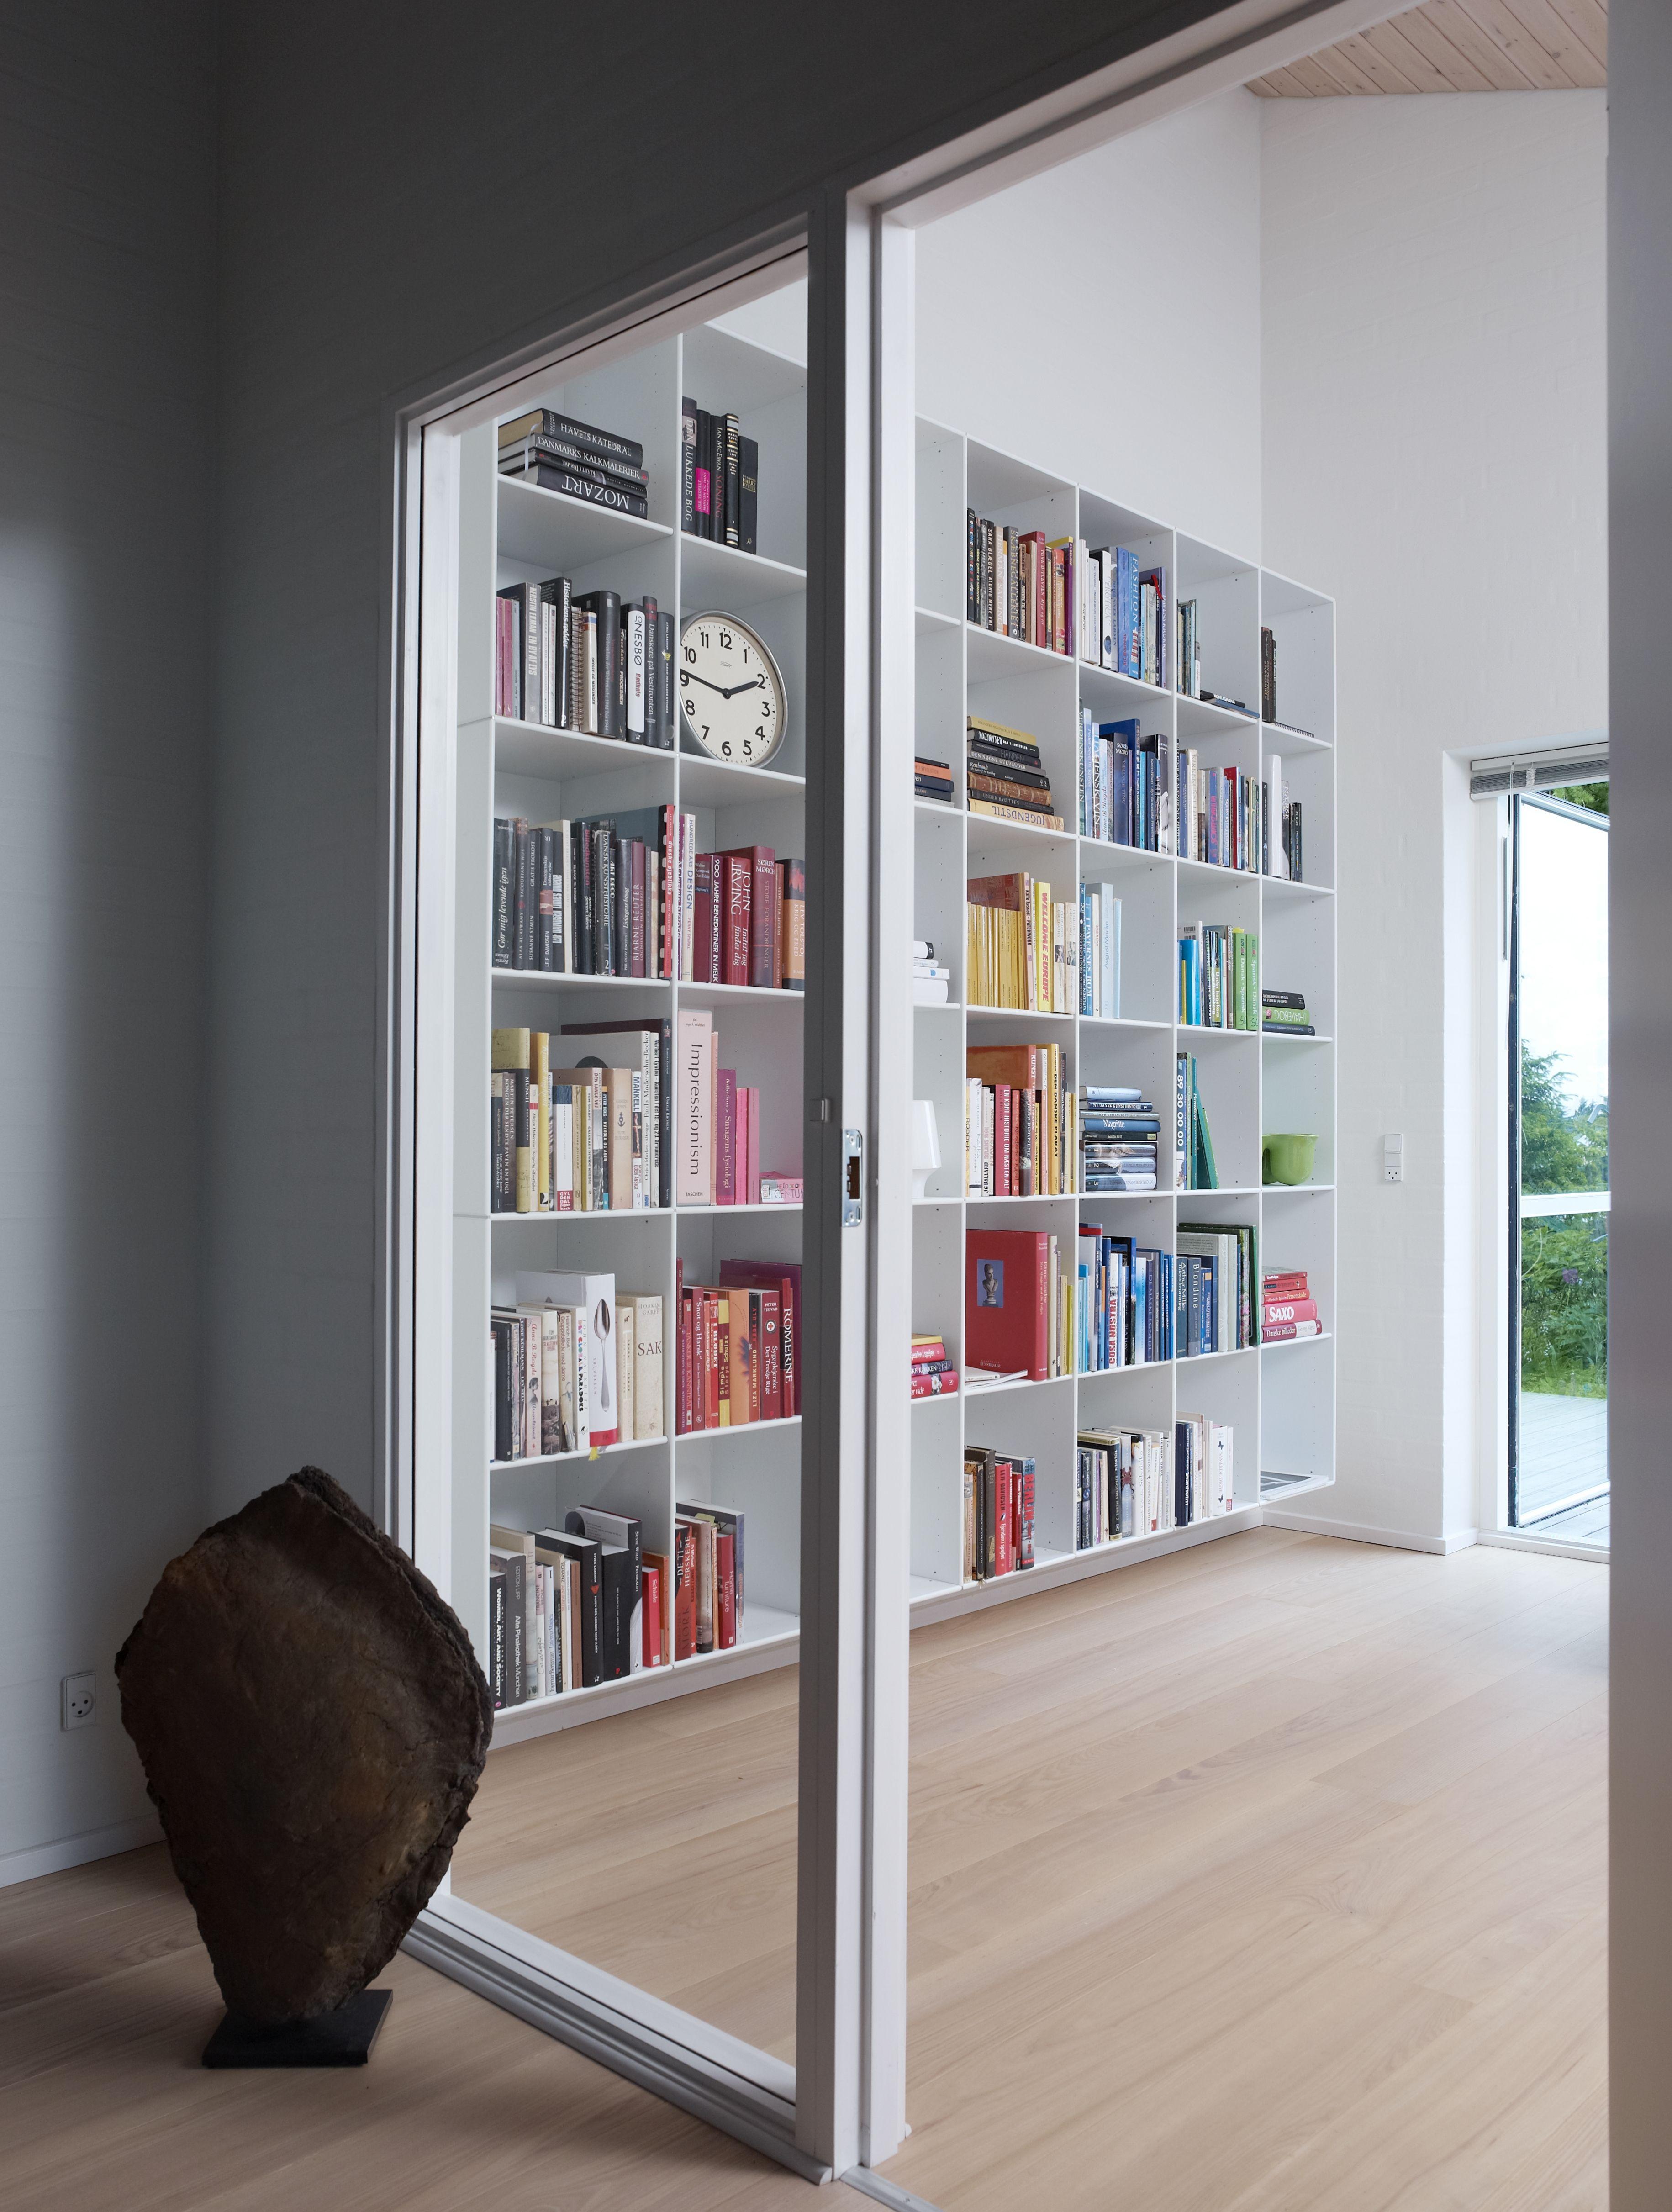 Hoge boekenkast op plint - ABC Quadrant - Designkasten - Kasten ...